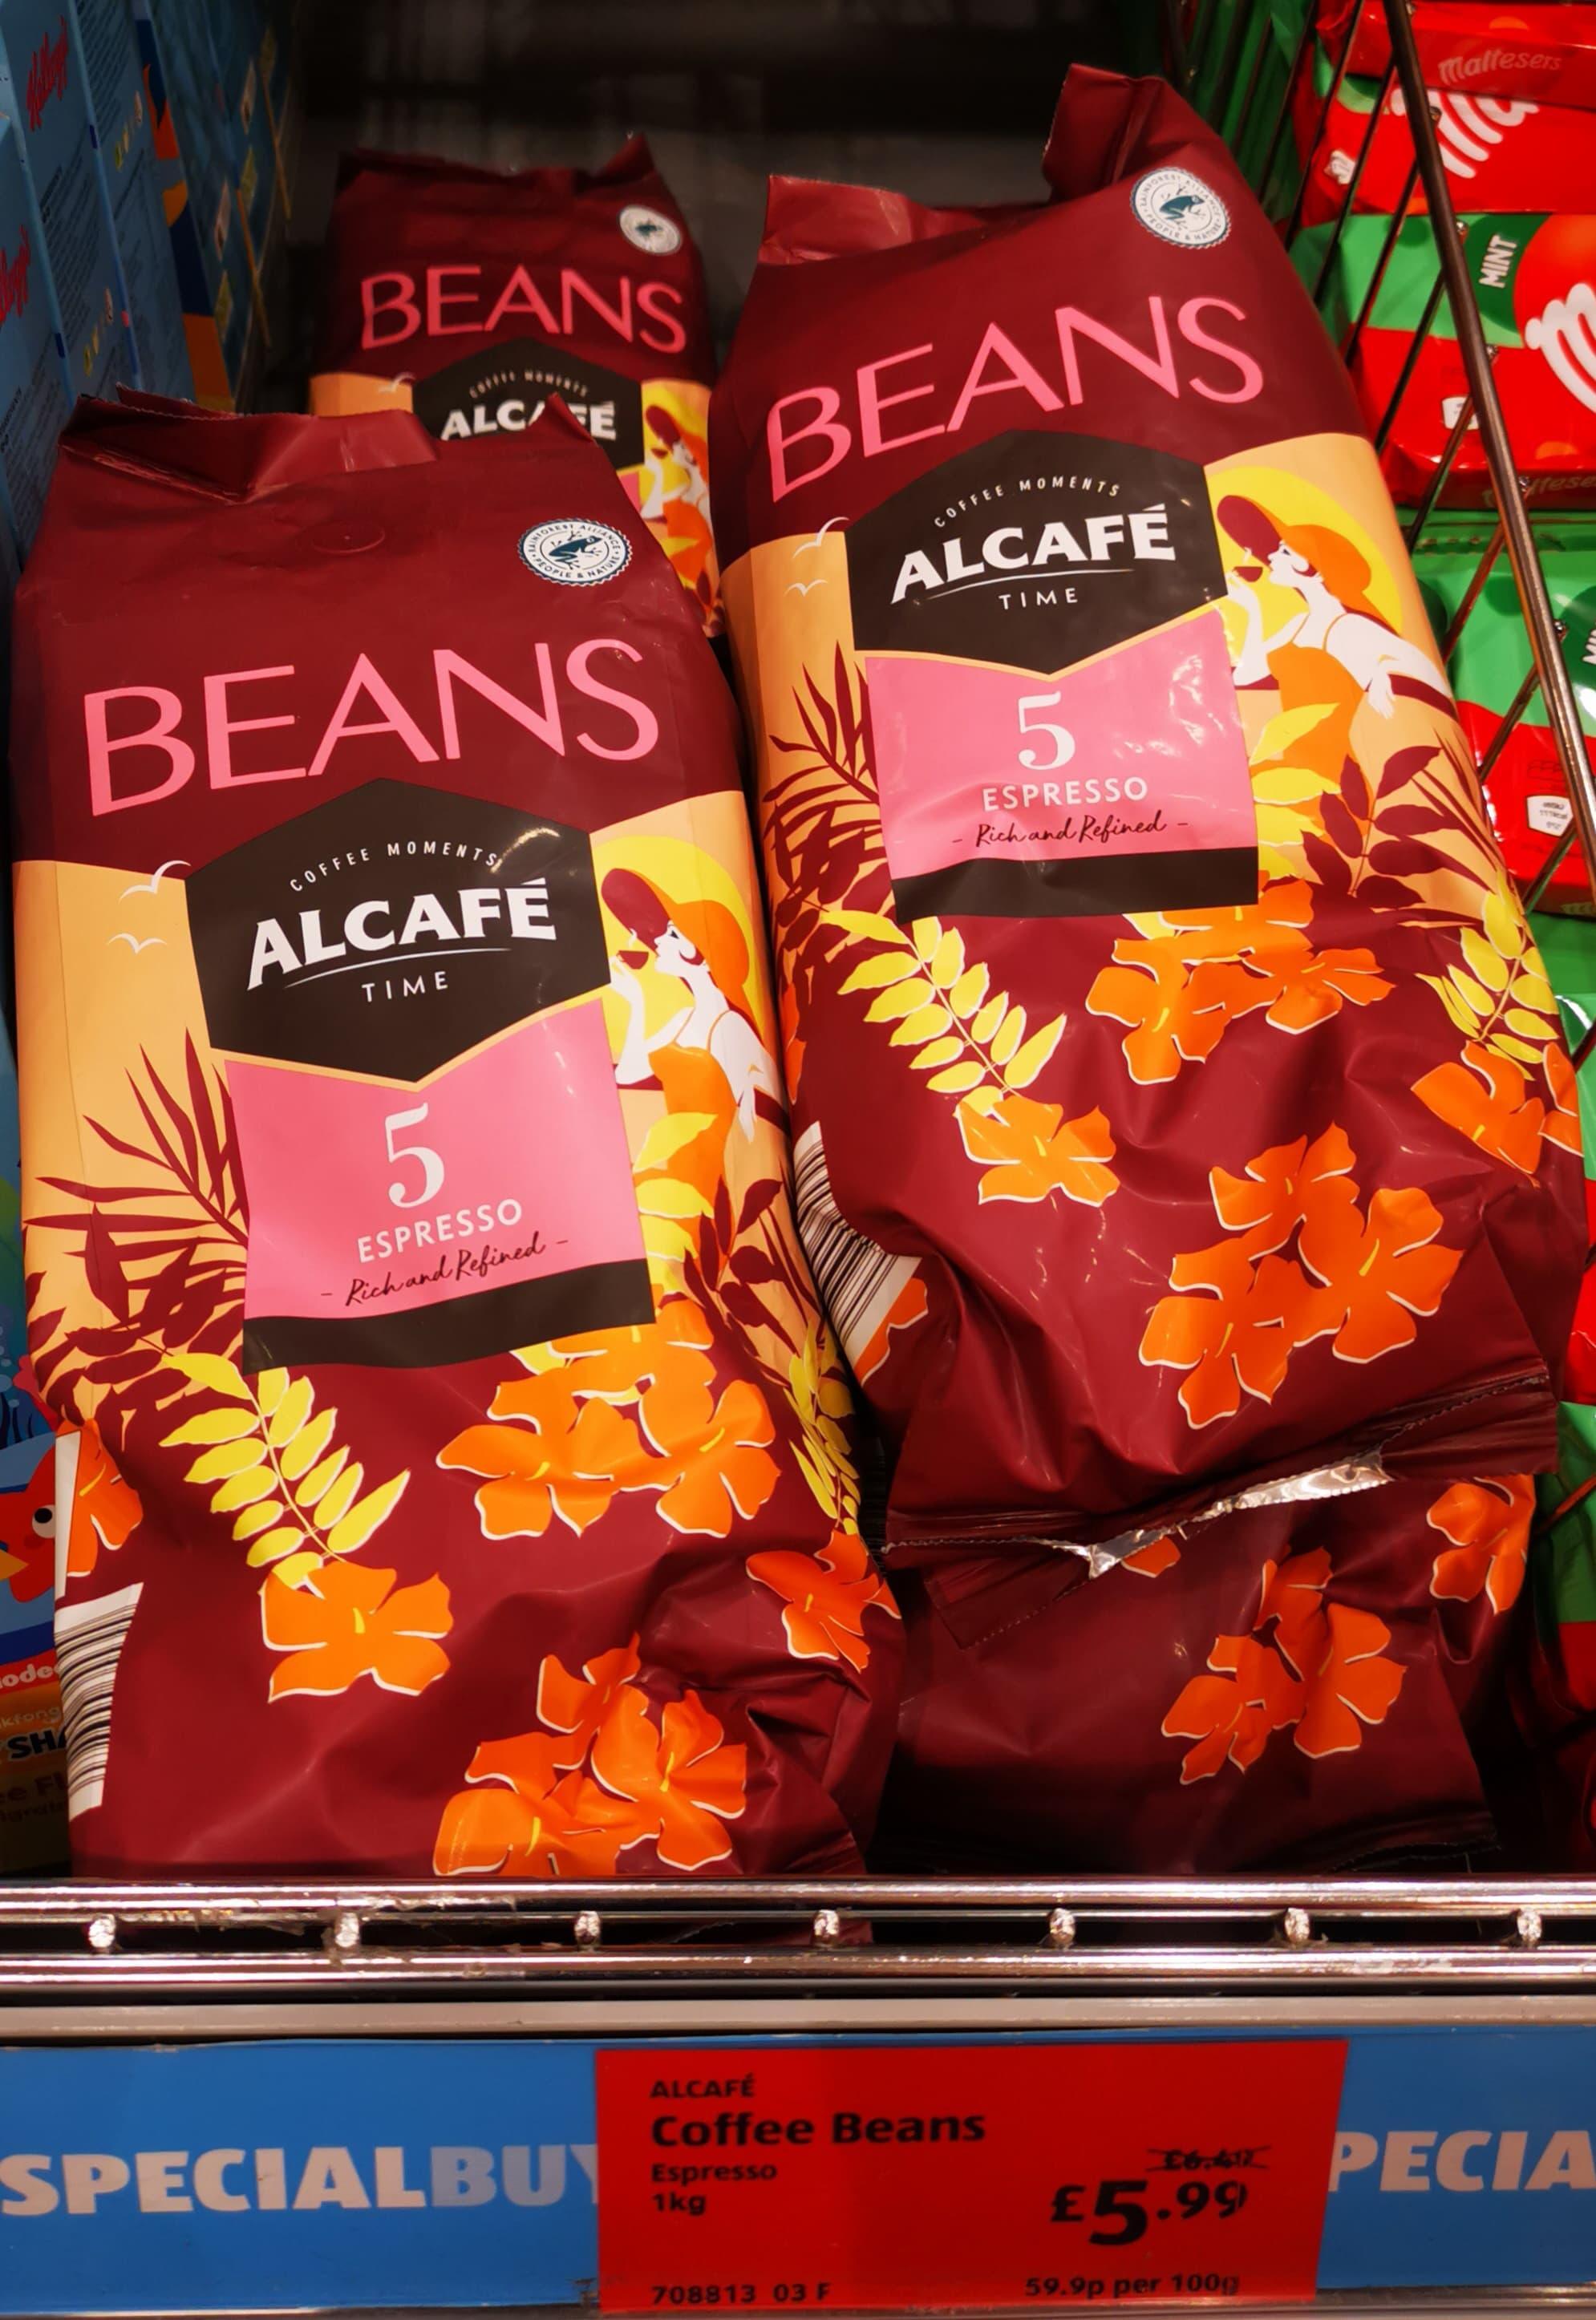 Alcafé Espresso 1kg Coffee Beans - £5.99 In Store @ Aldi (High Street, Glasgow)